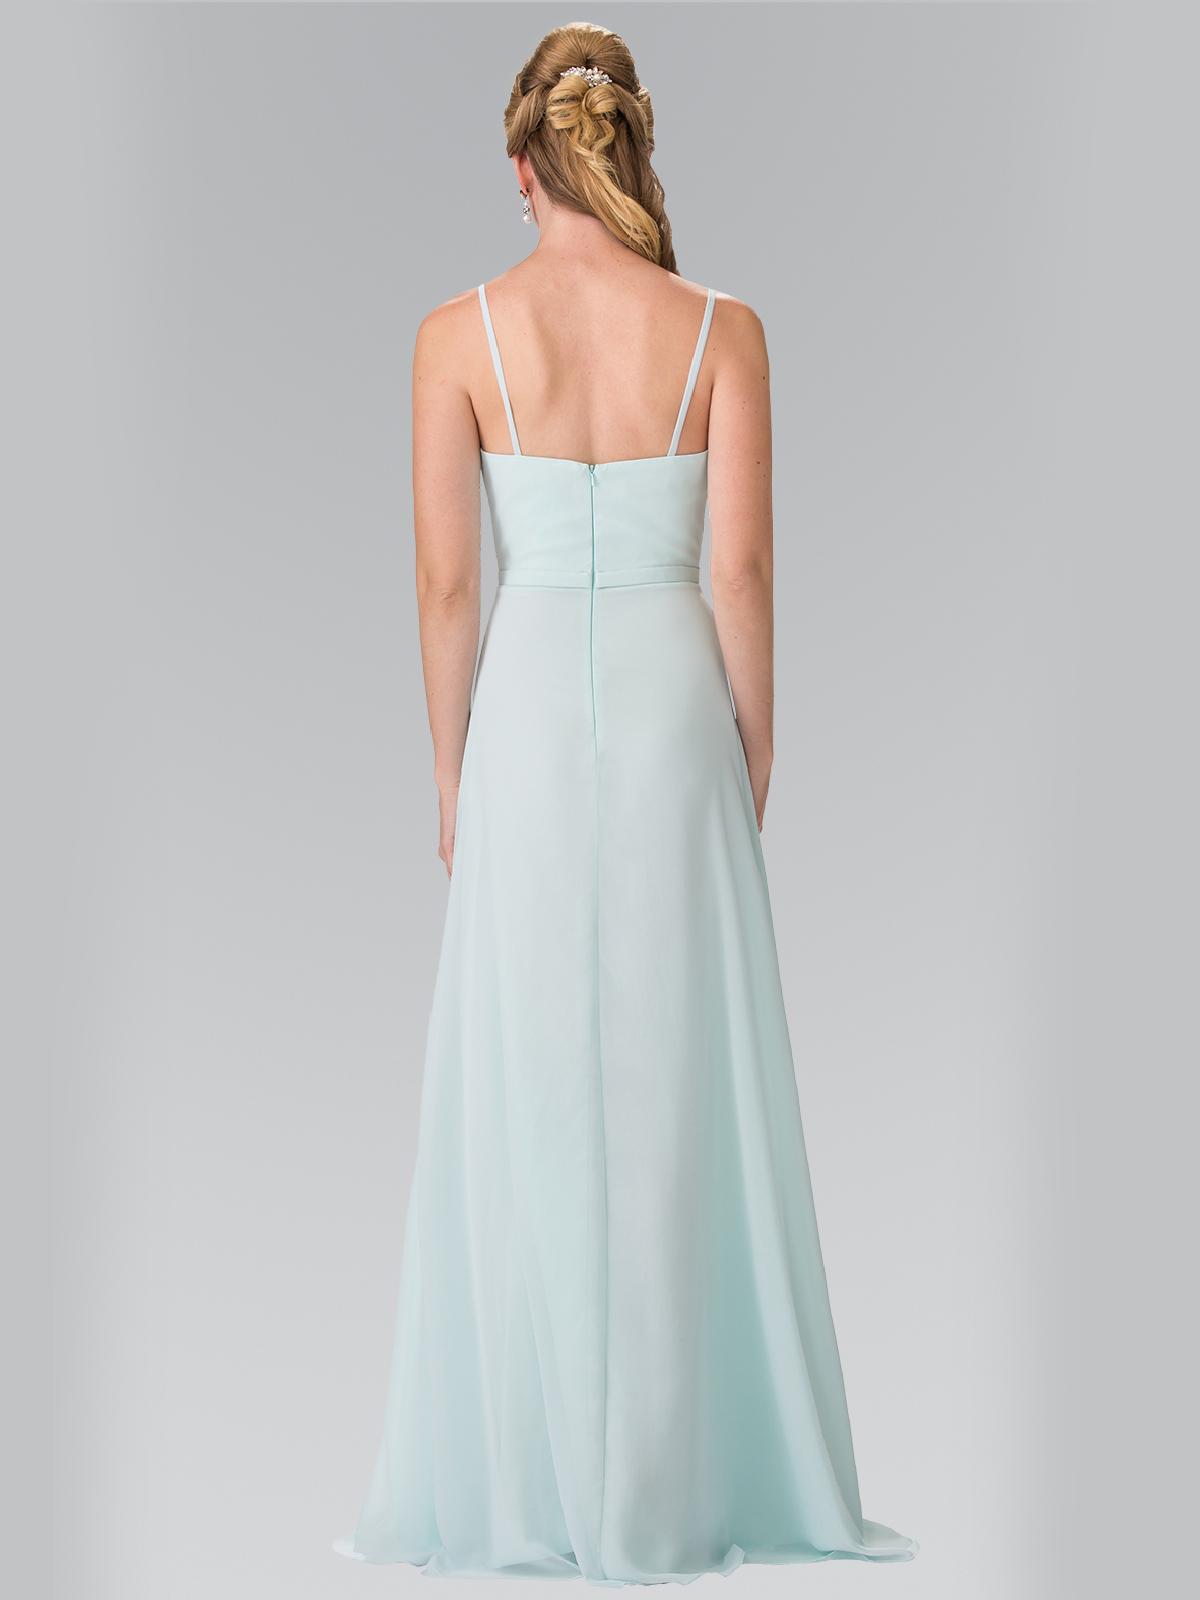 Chiffon bridesmaid dress with spaghetti straps sung boutique la 50 2374 chiffon bridesmaid dress with spaghetti straps mint back view medium ombrellifo Gallery